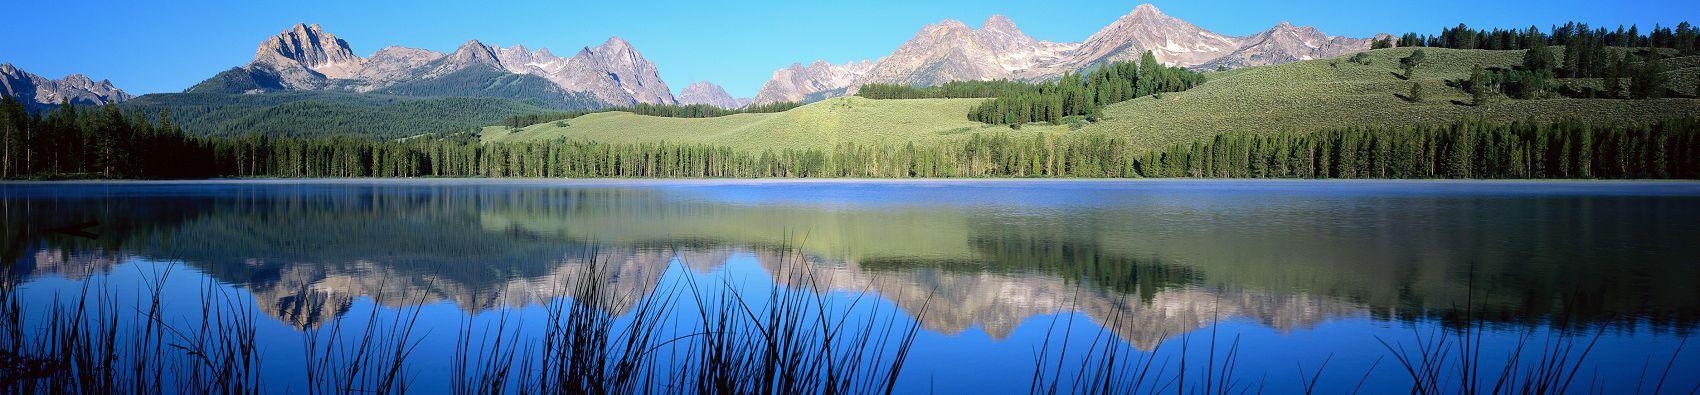 Горы природа